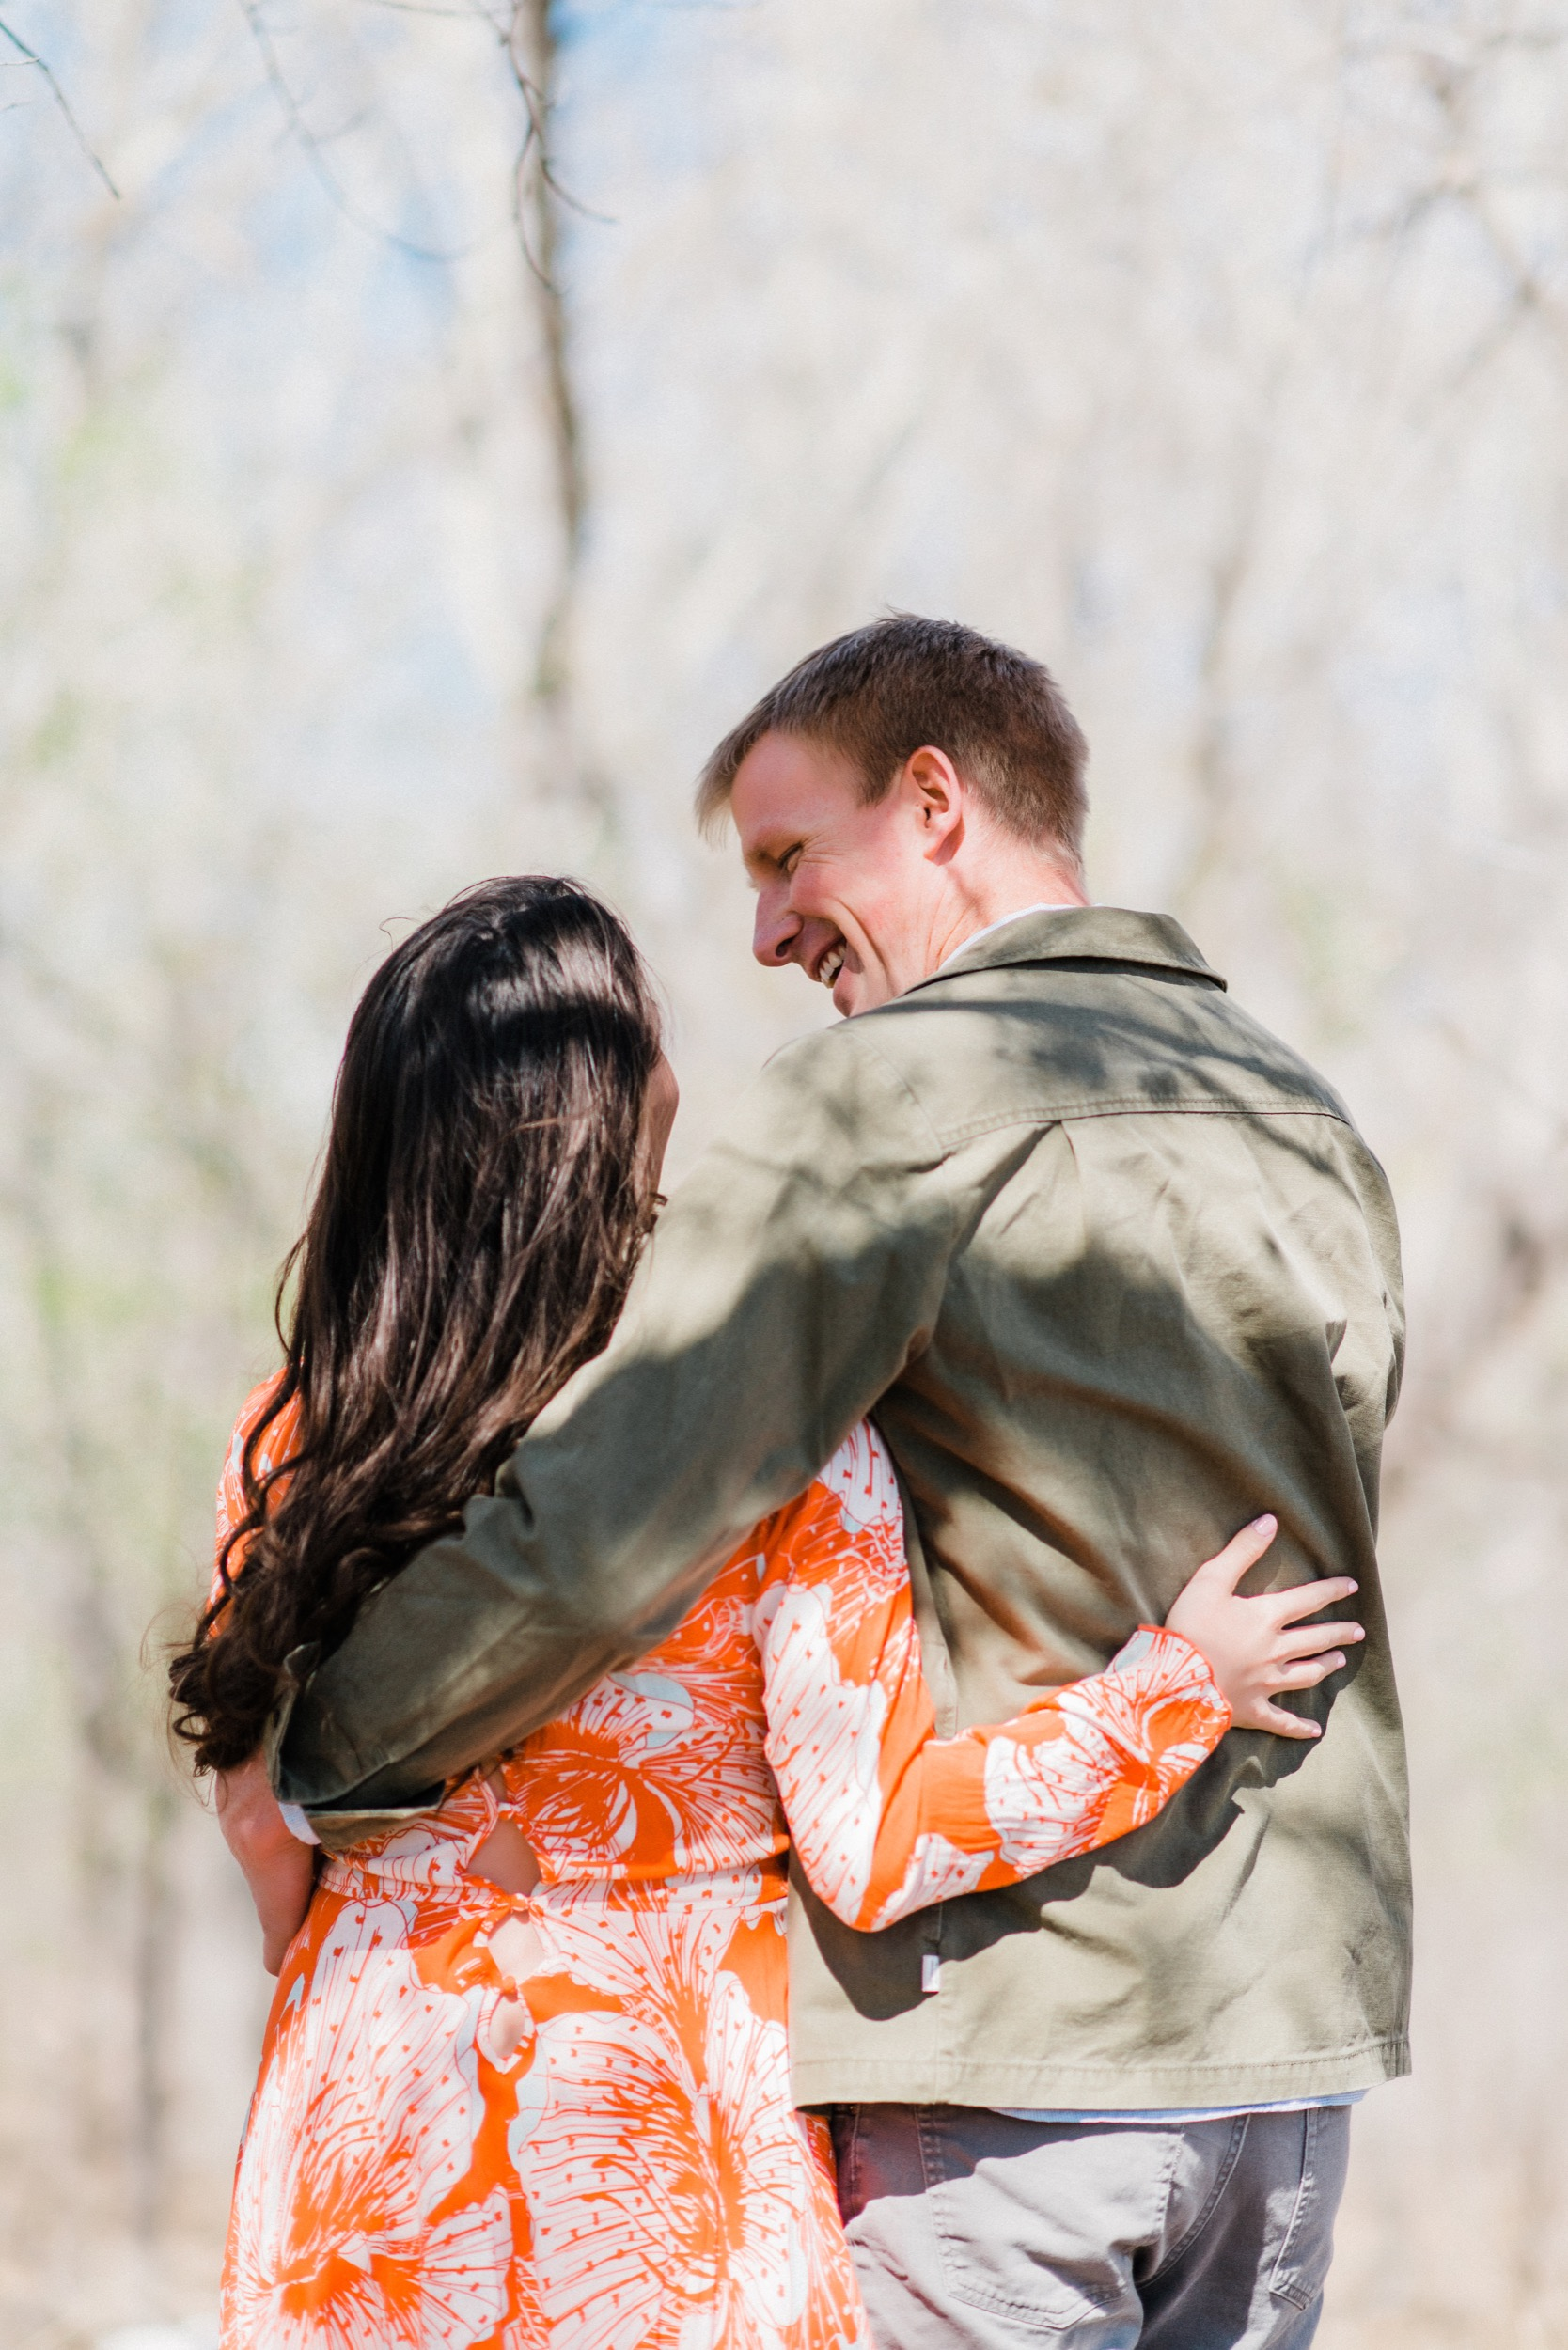 Carissa and Ben-maternity-southwest photographer-destination photographer-new mexico wedding-1001.2.jpg